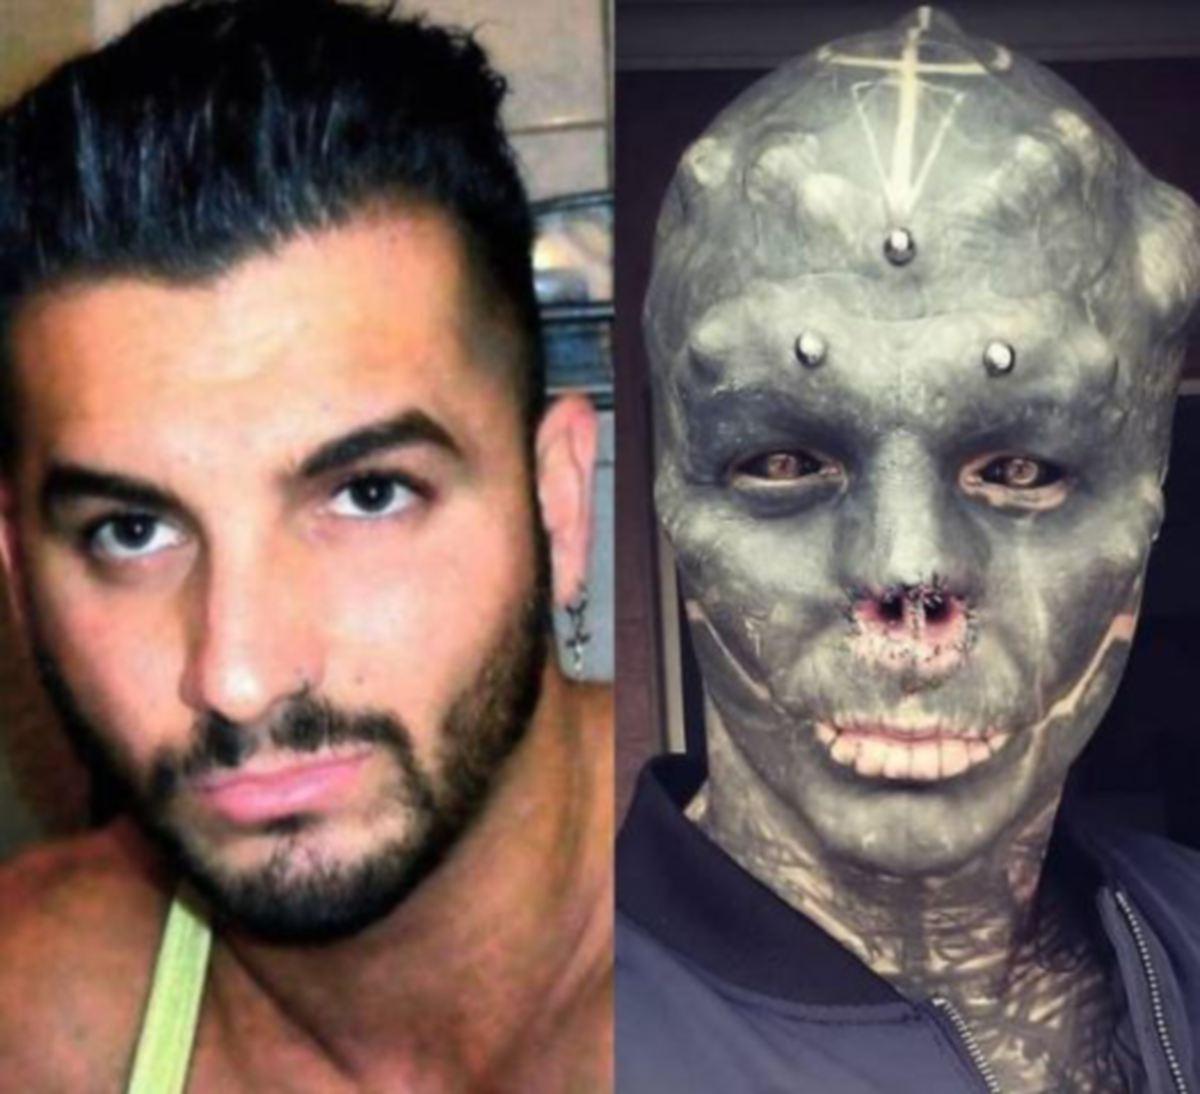 LOFFREDO sebelum dan selepas menjadi mengubah wajahnya. FOTO Agensi